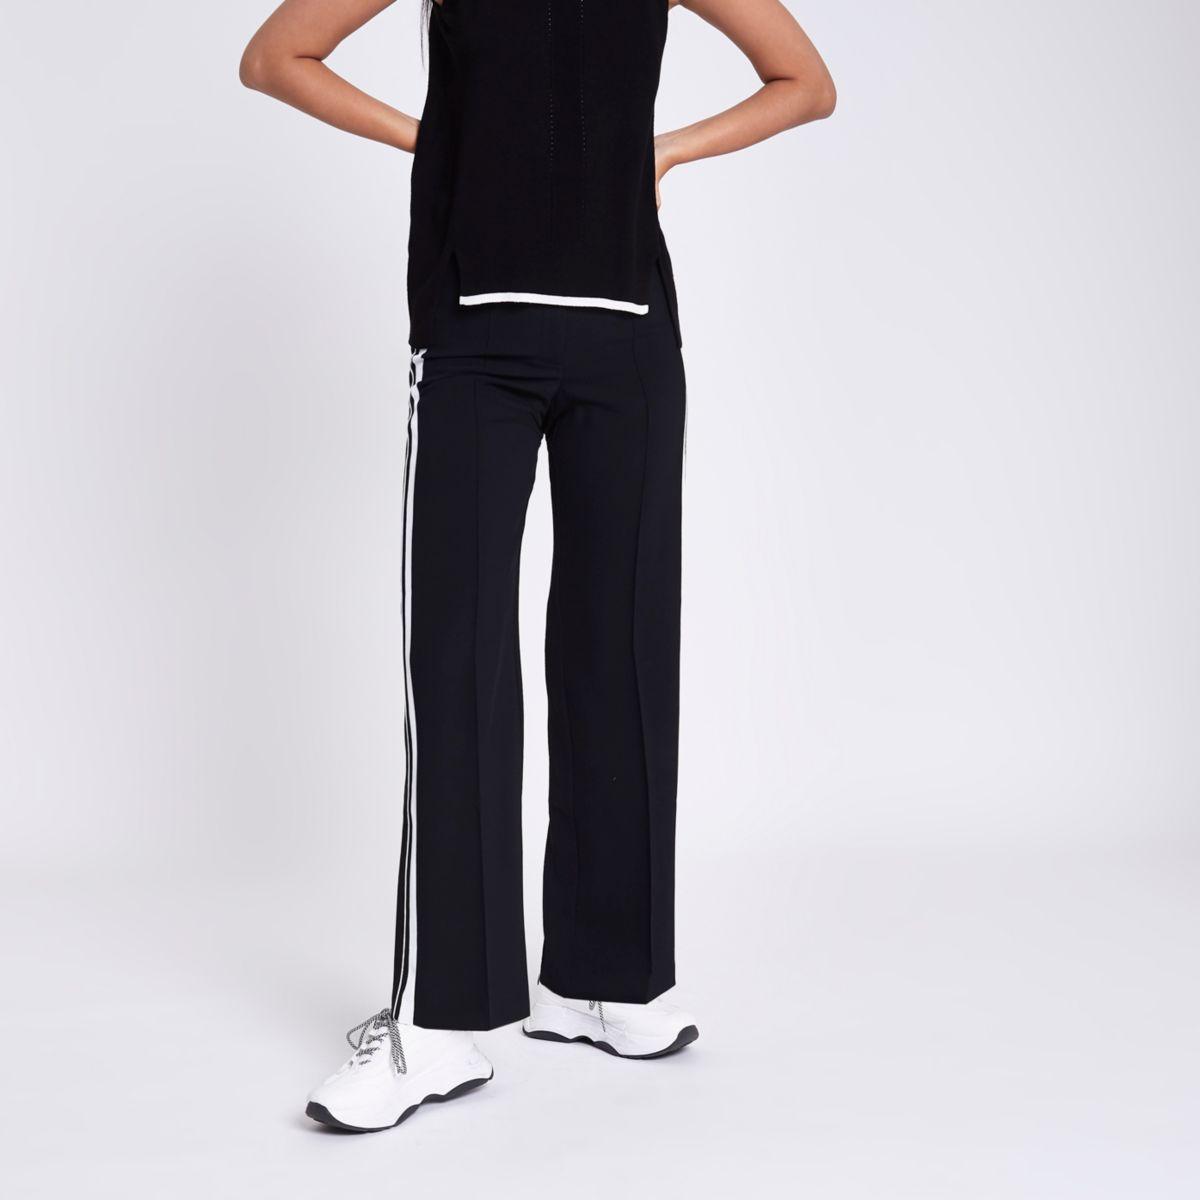 Black straight leg side stripe pants